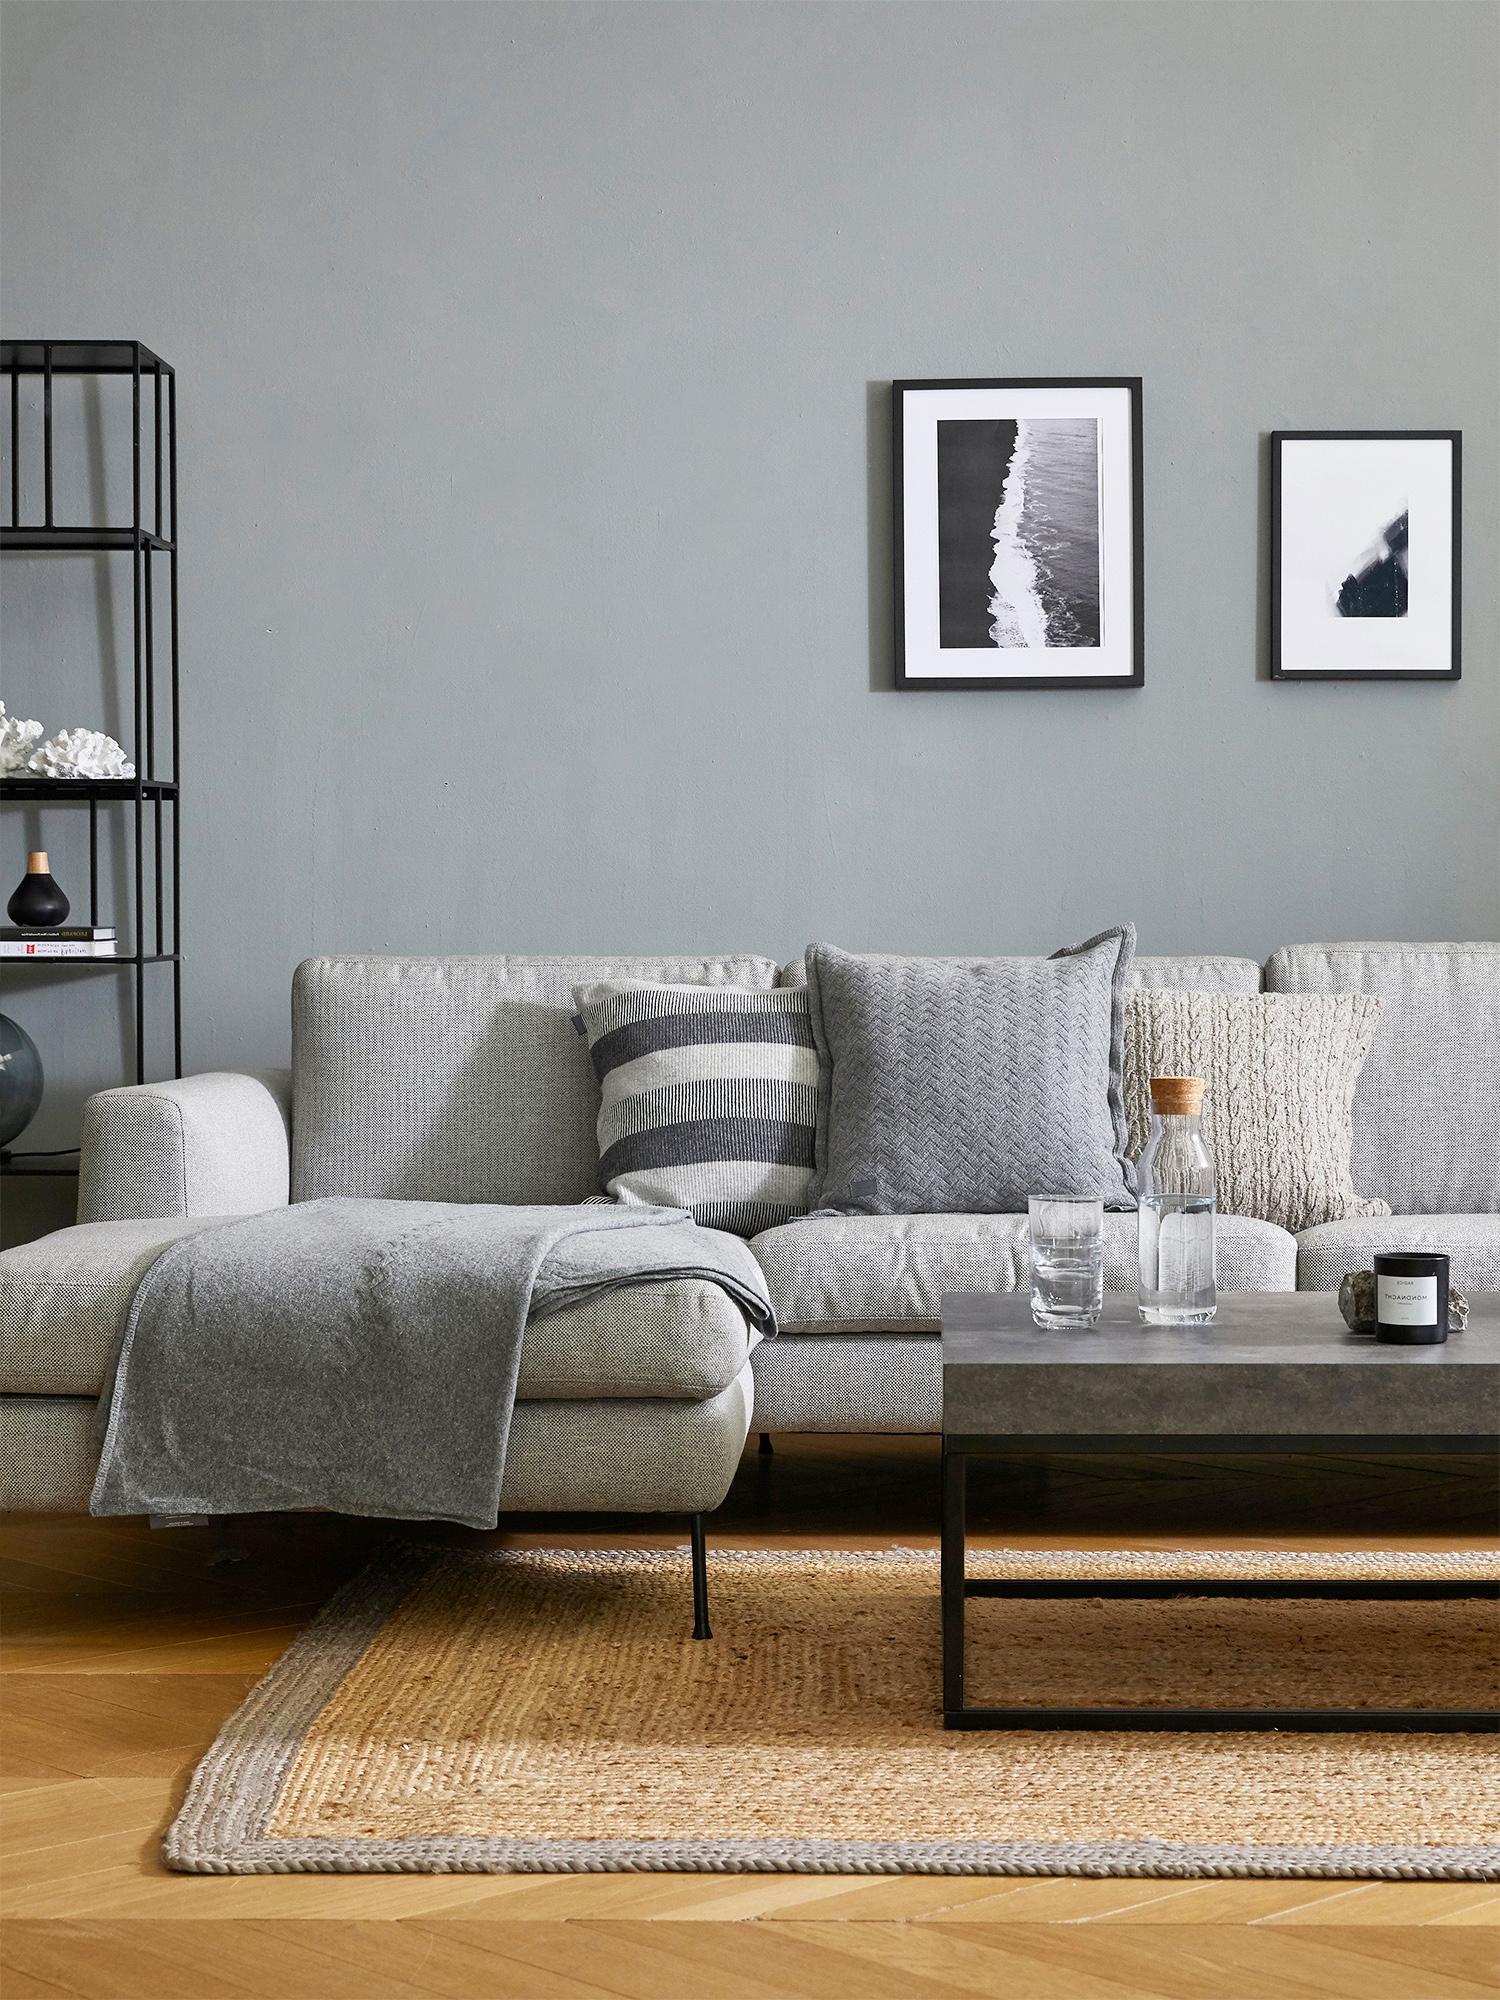 Ecksofa Cucita (3-Sitzer), Bezug: Webstoff (Polyester) Der , Gestell: Massives Kiefernholz, Füße: Metall, lackiert, Webstoff Hellgrau, B 262 x T 163 cm